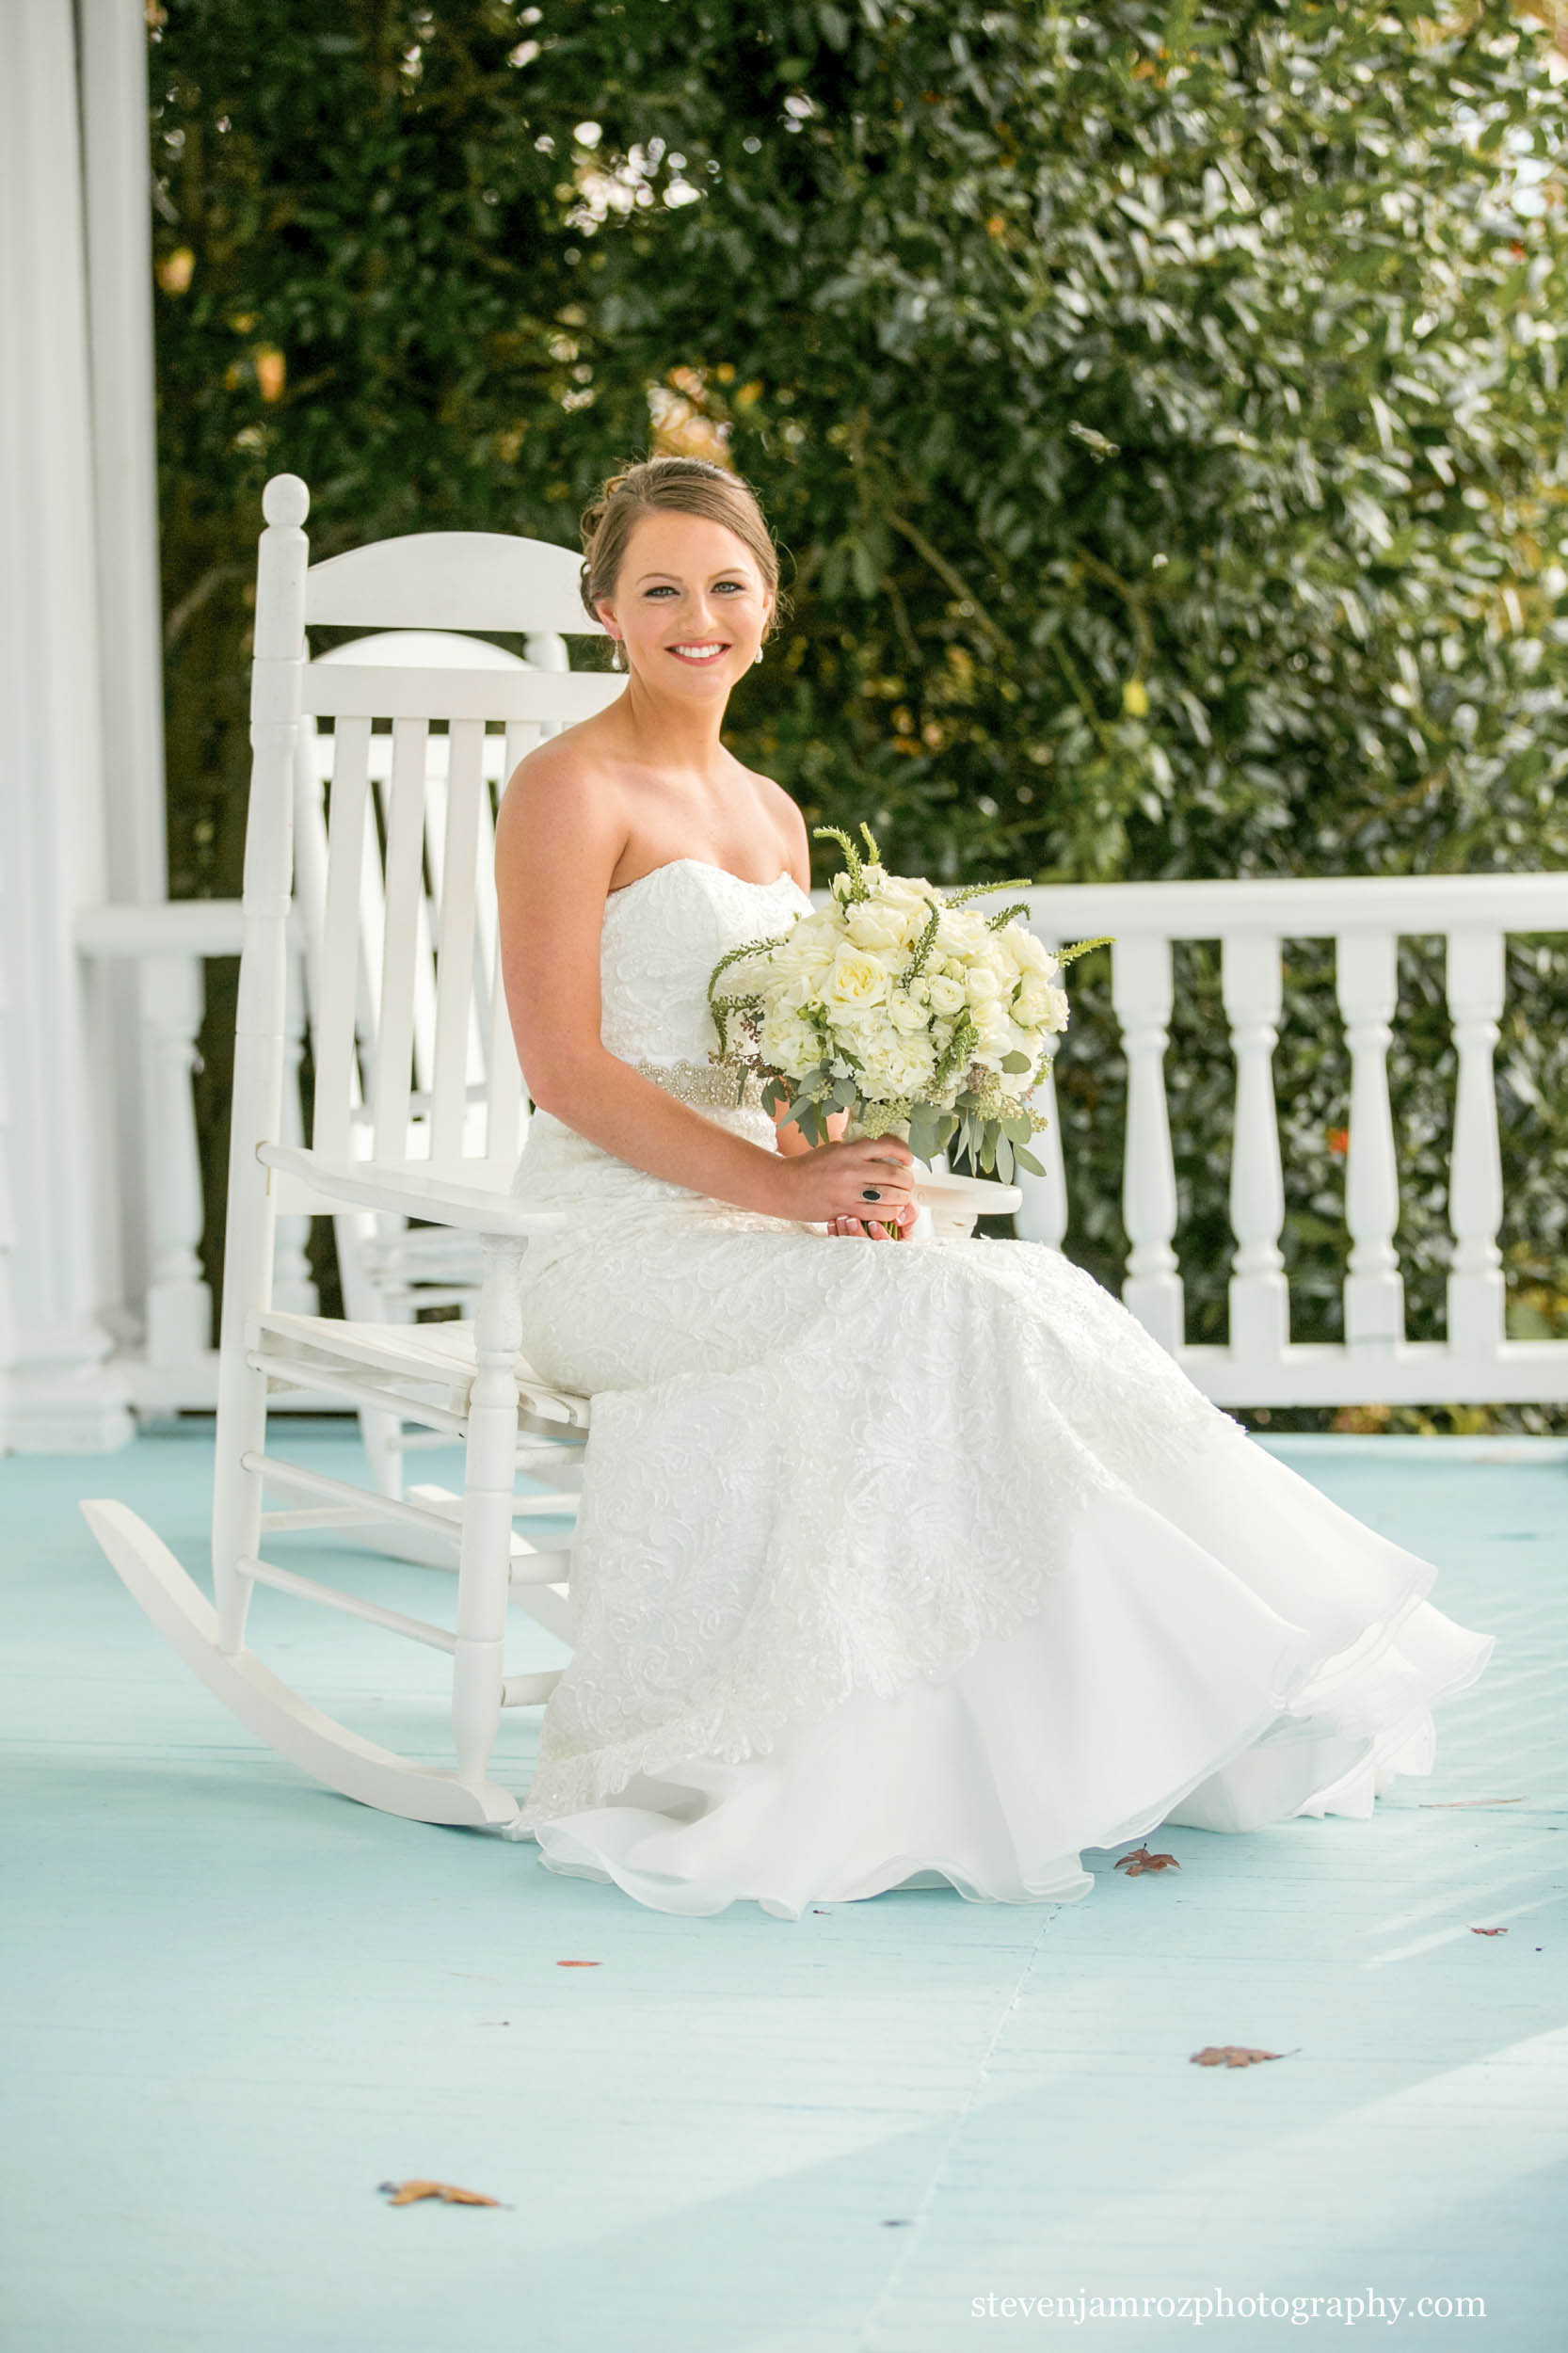 front-porch-bride-portrait-hudson-manor-steven-jamroz-photography-0581.jpg